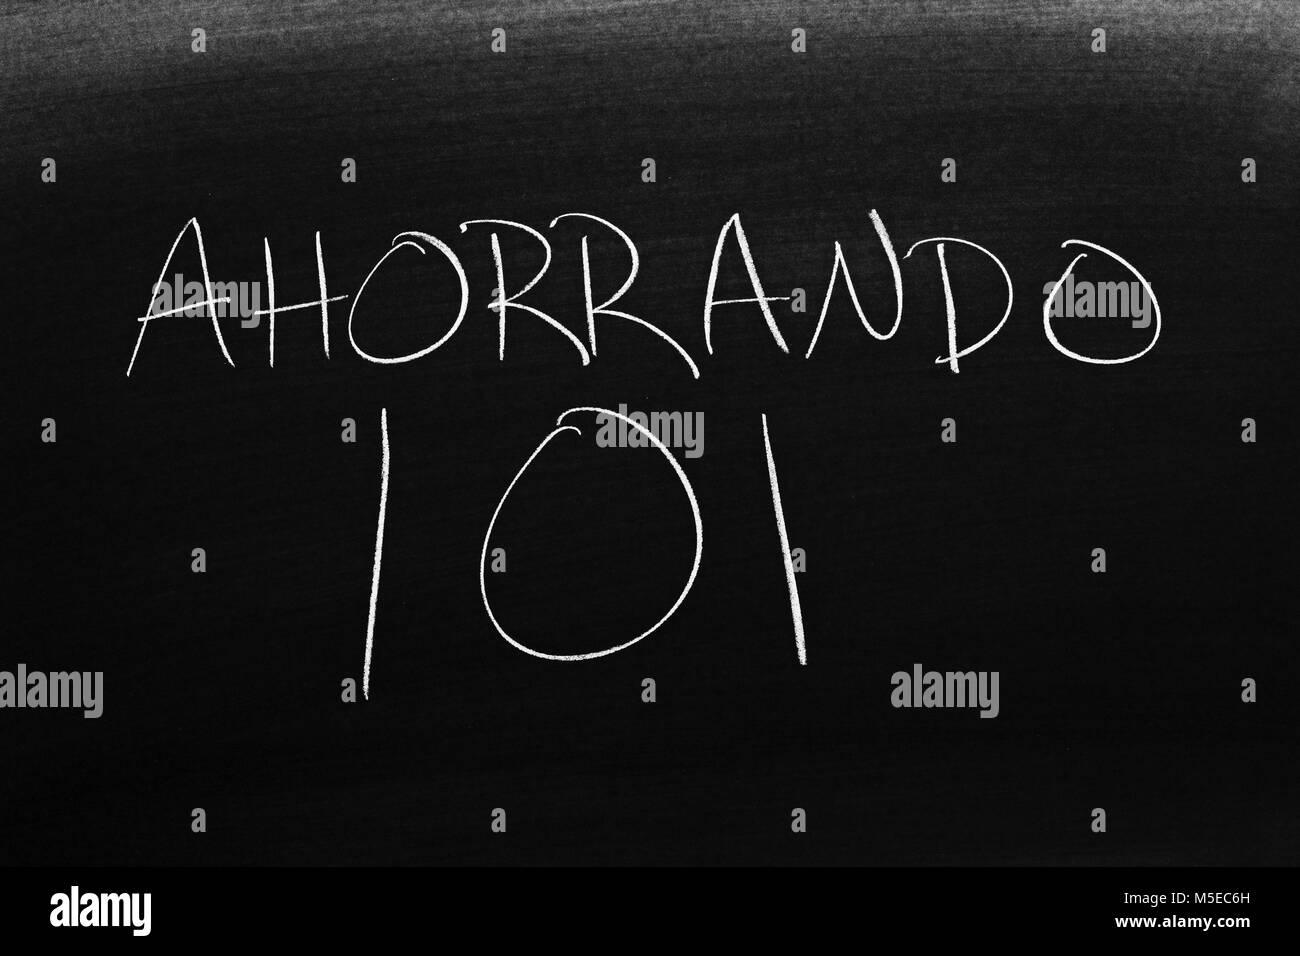 The words Ahorrando 101 on a blackboard in chalk - Stock Image